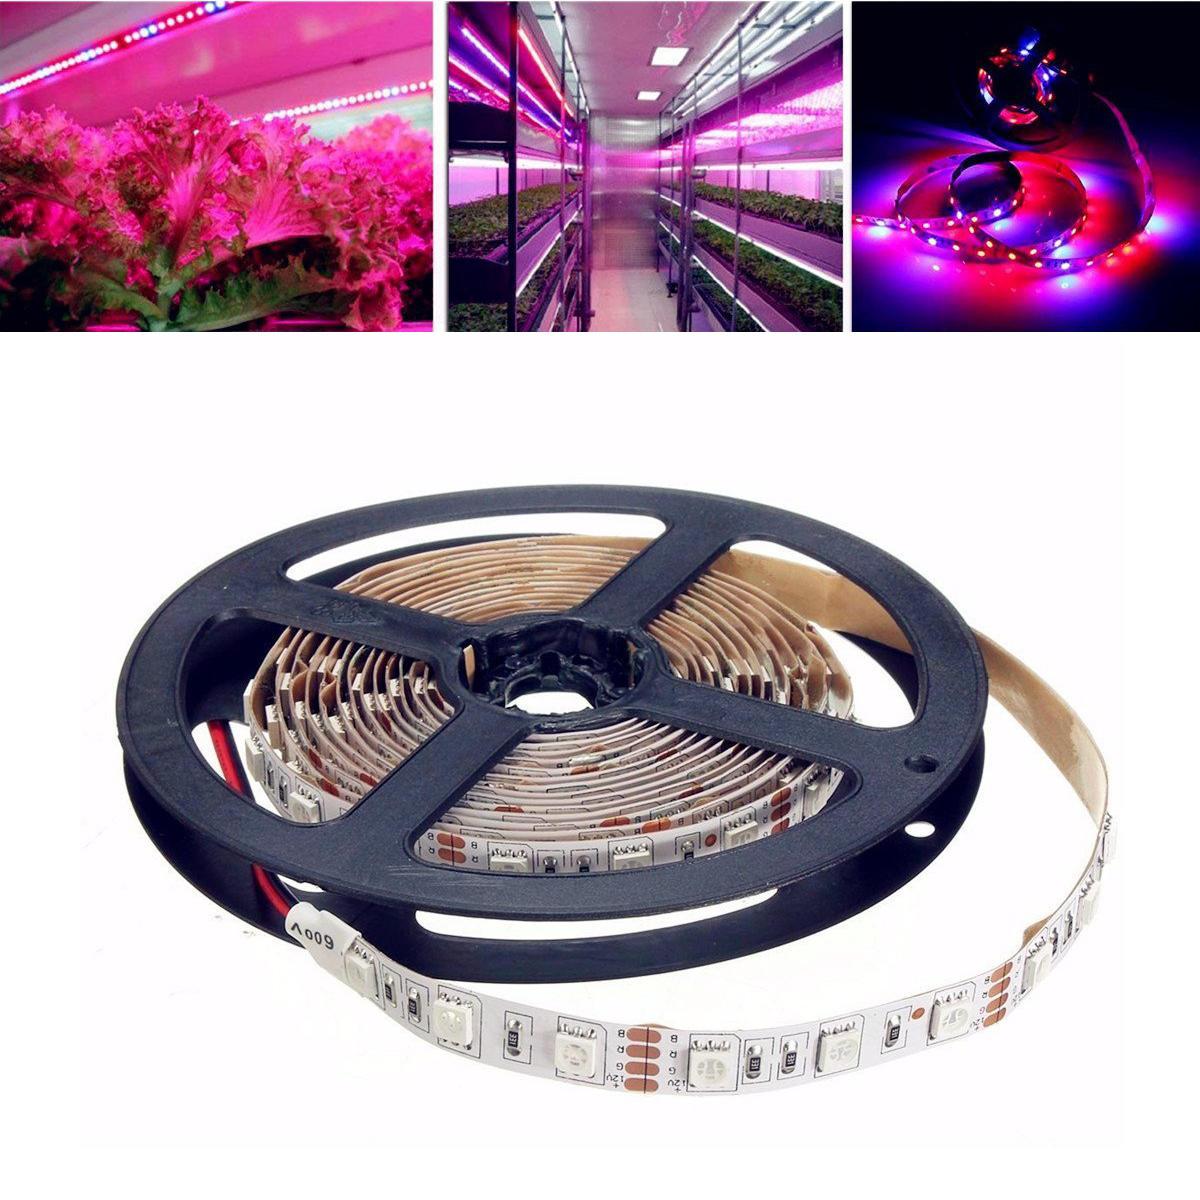 1M/2M/3M/4M/5M SMD5050 Non-Waterproof LED Grow Lights Full Spectrum Plant Strip Lamp DC12V